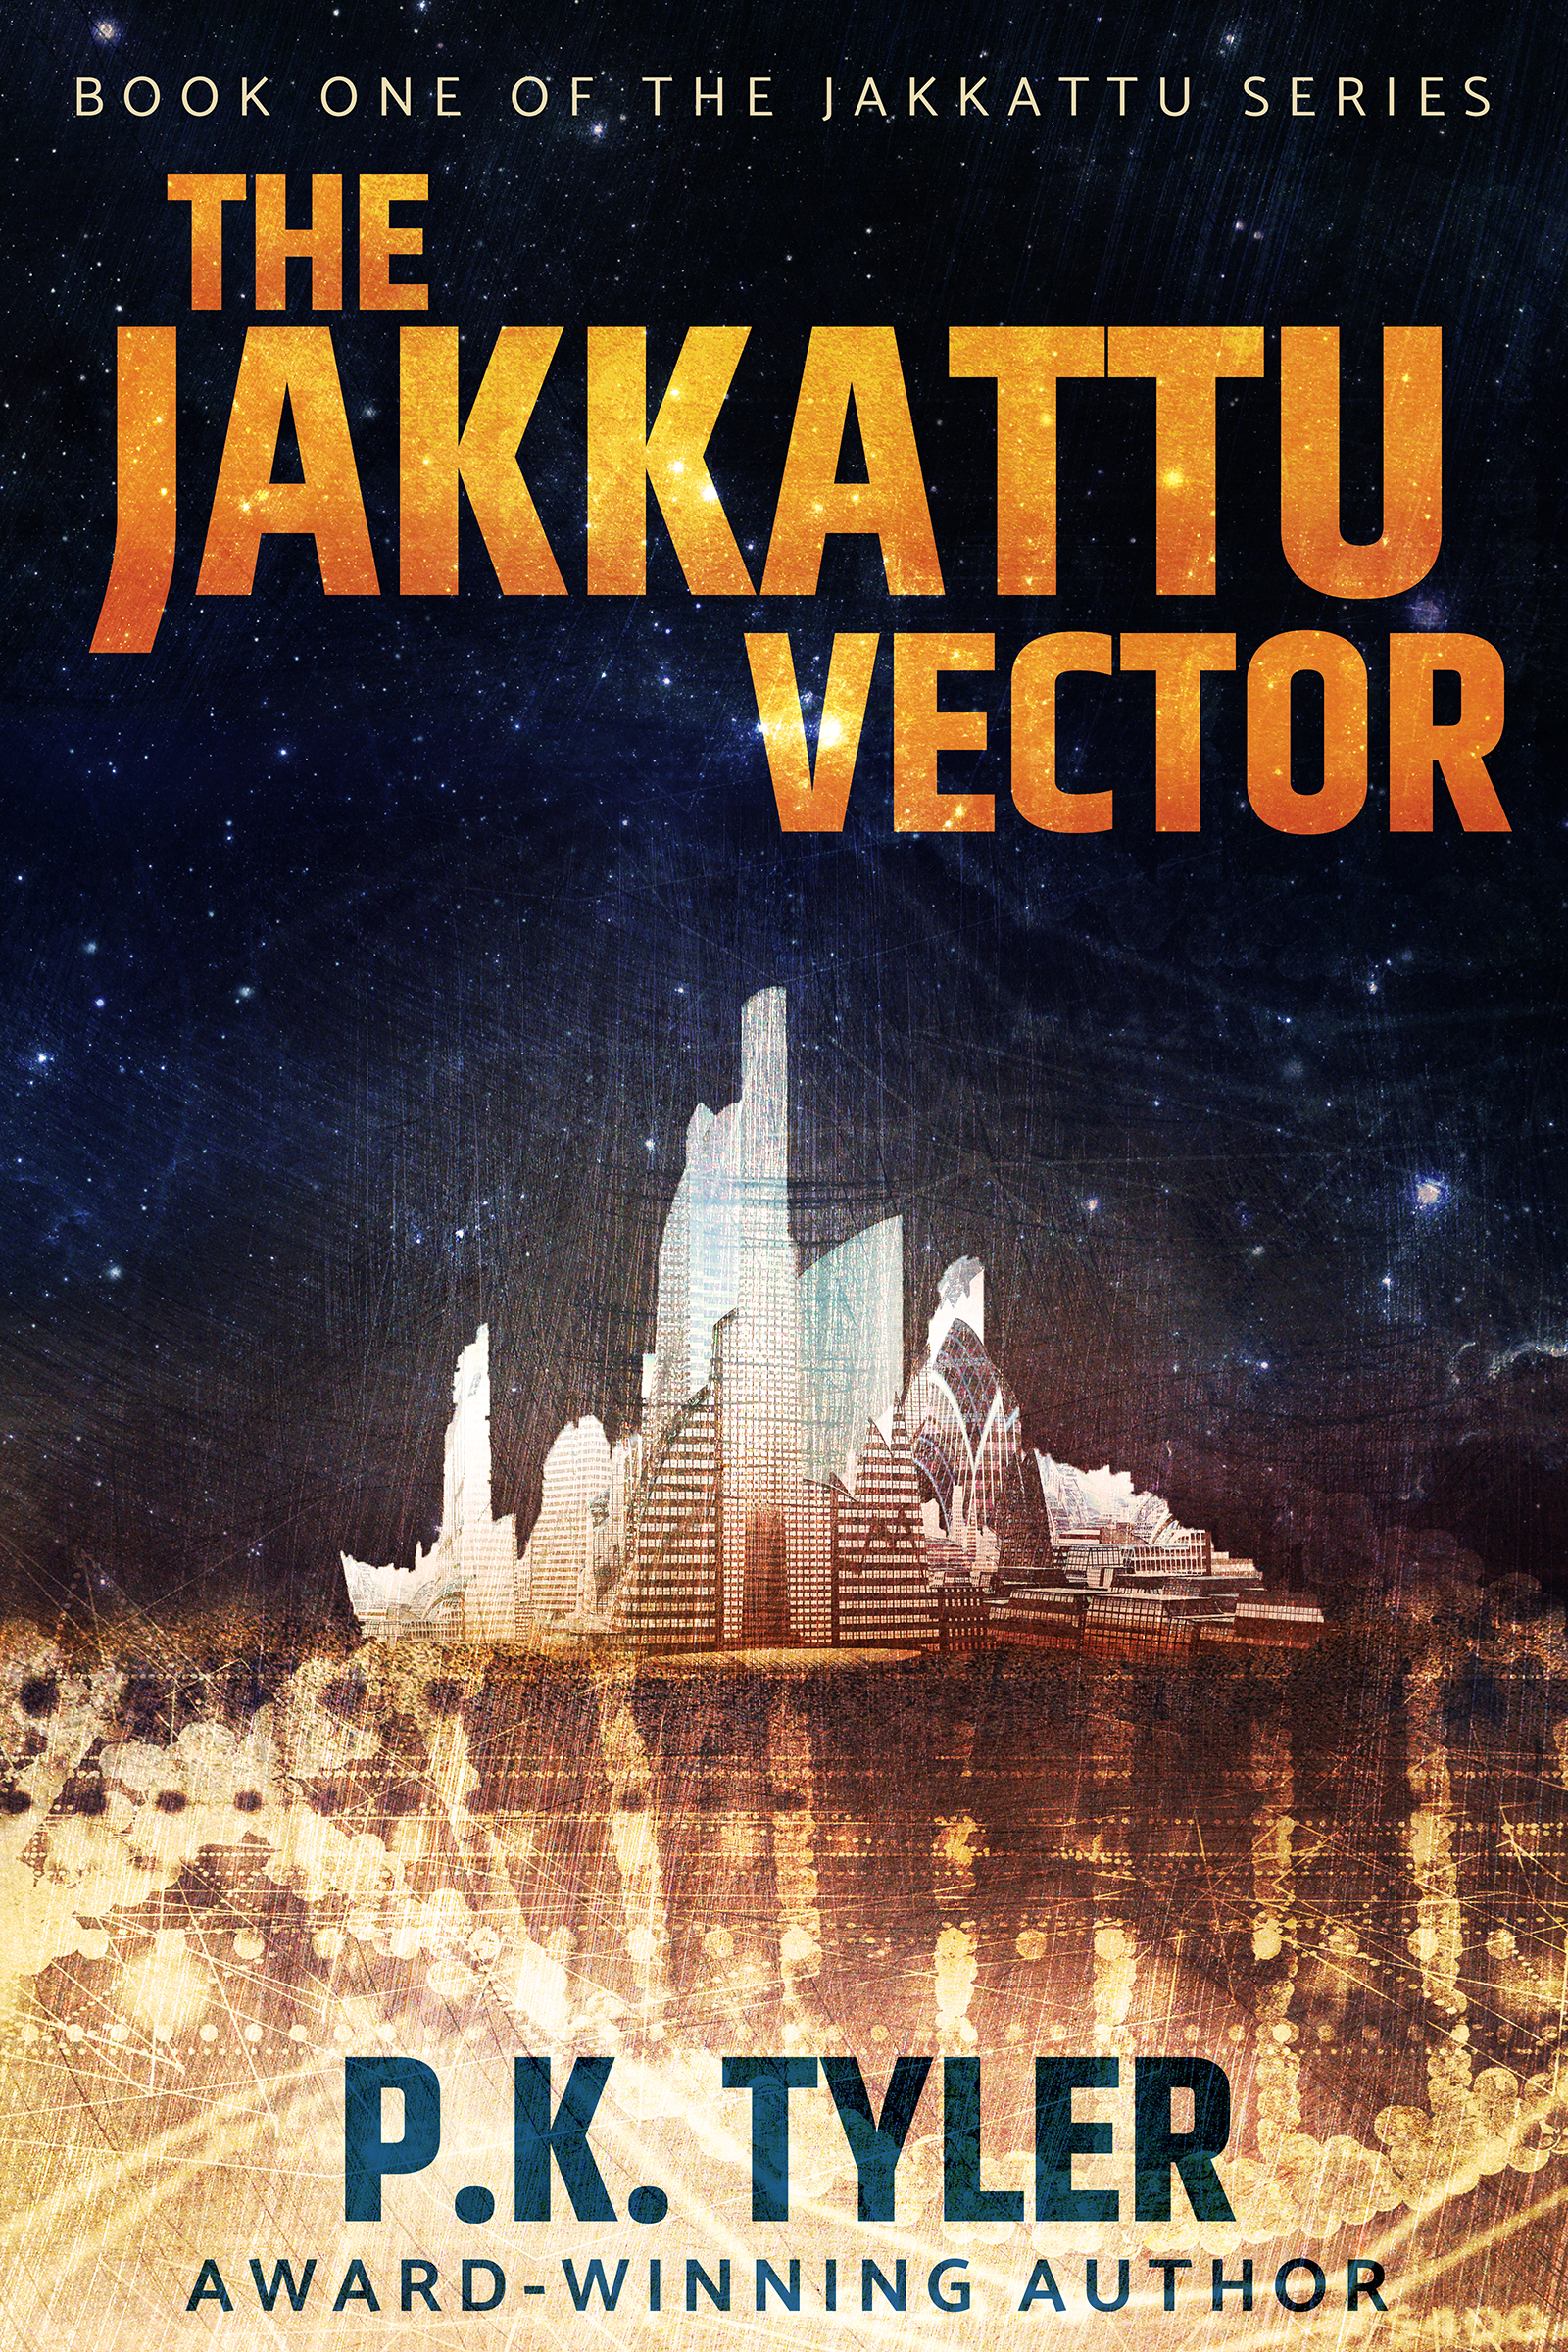 The Jakkattu Vector – Book One